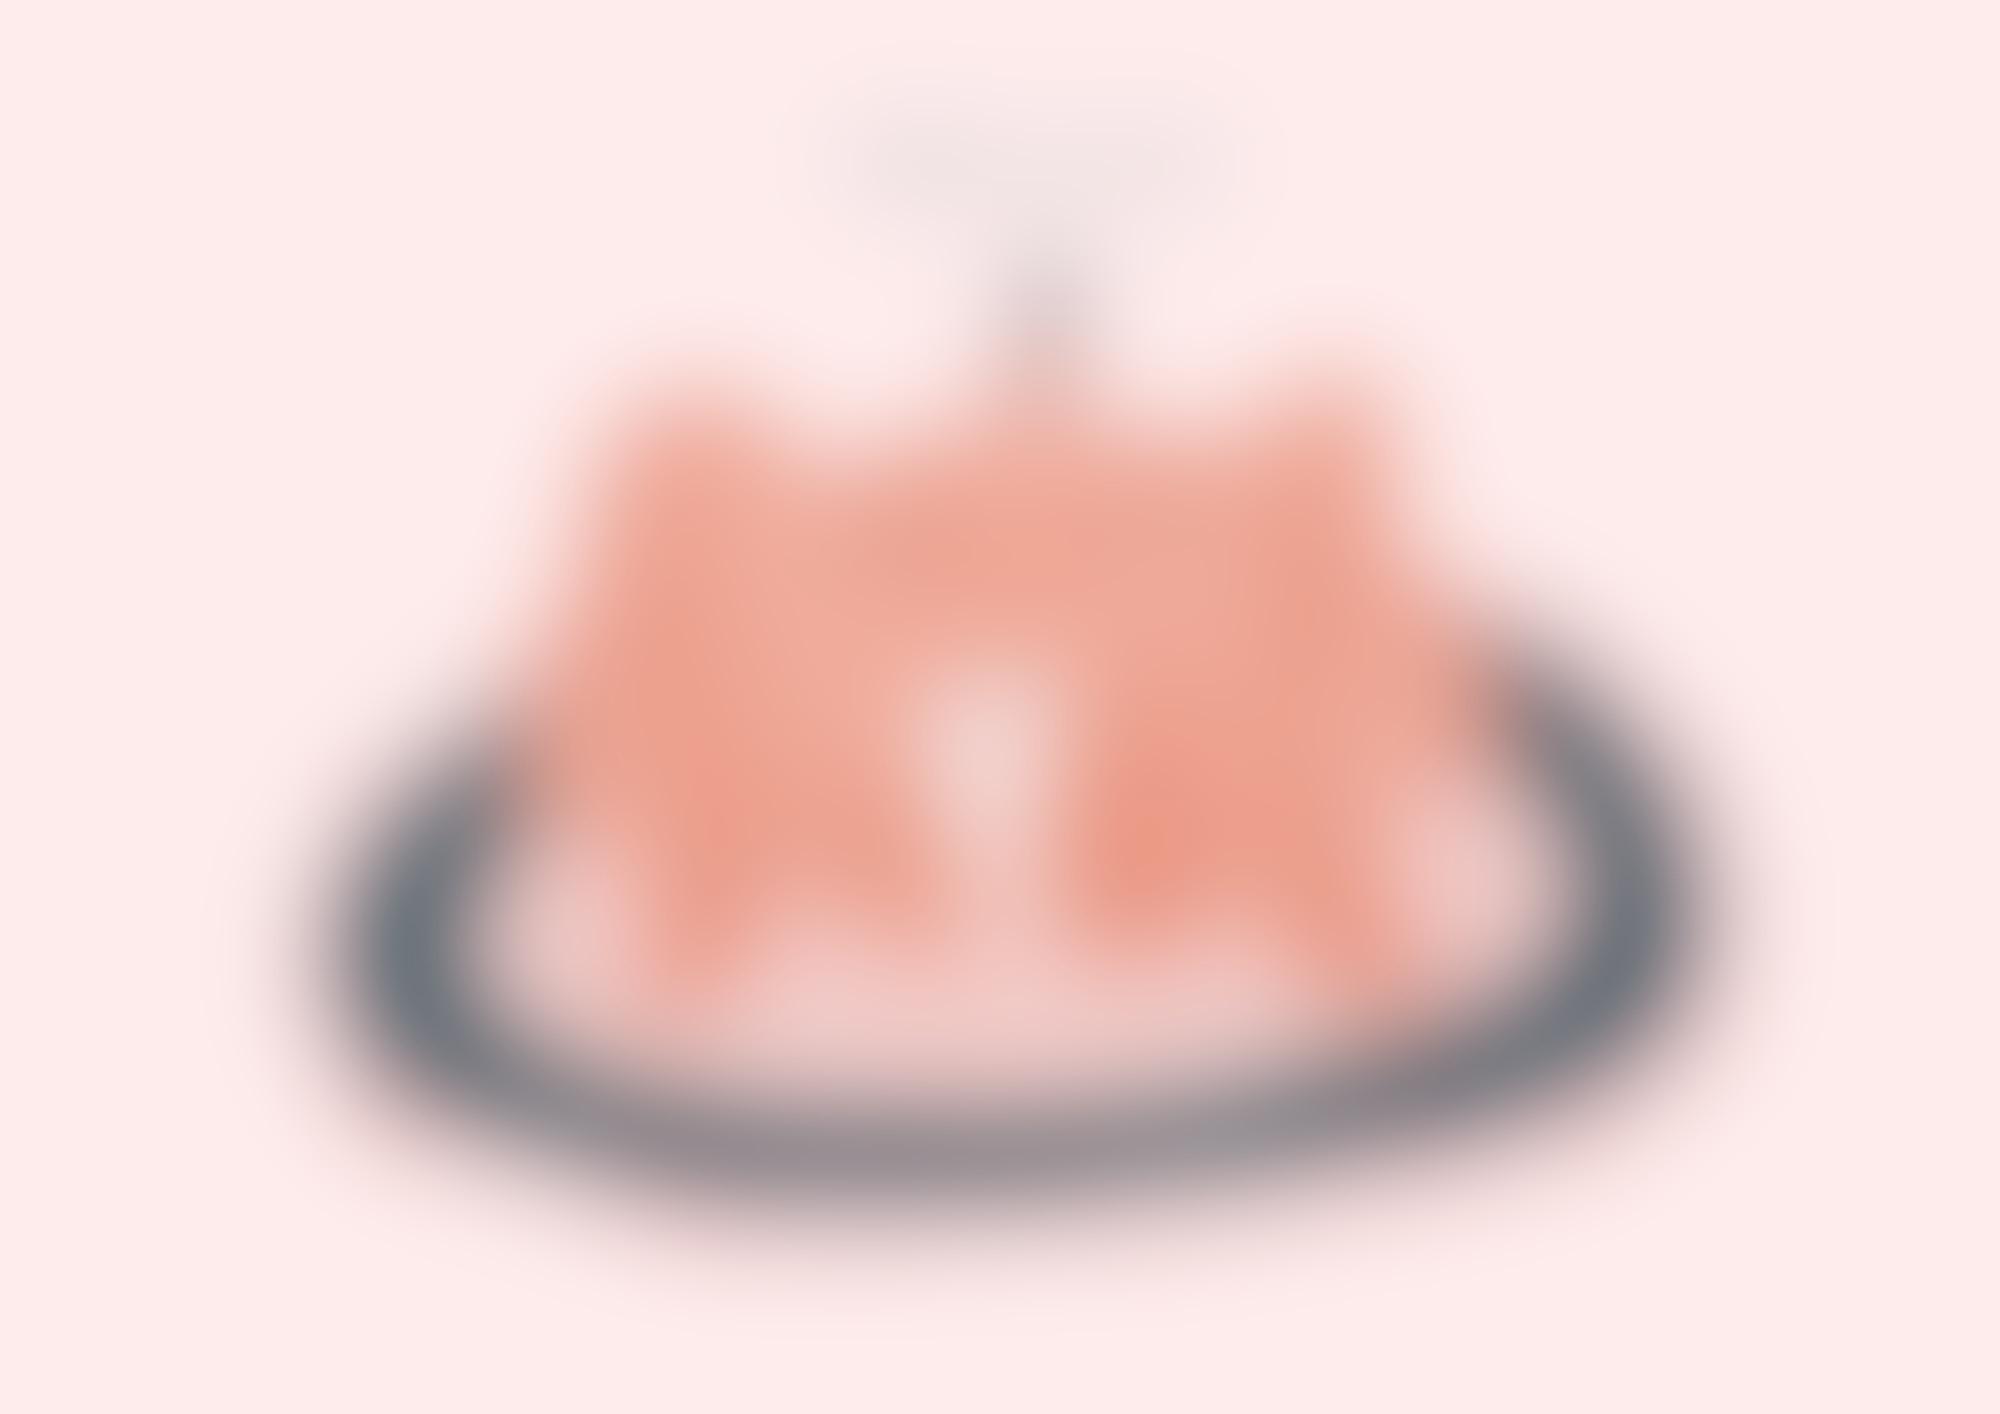 Rosi tooth illustrator lecture in progress17 autocompressfitresizeixlibphp 1 1 0max h2000max w3 D2000q80s6d14552e02a916e6d58341e332af5dcd